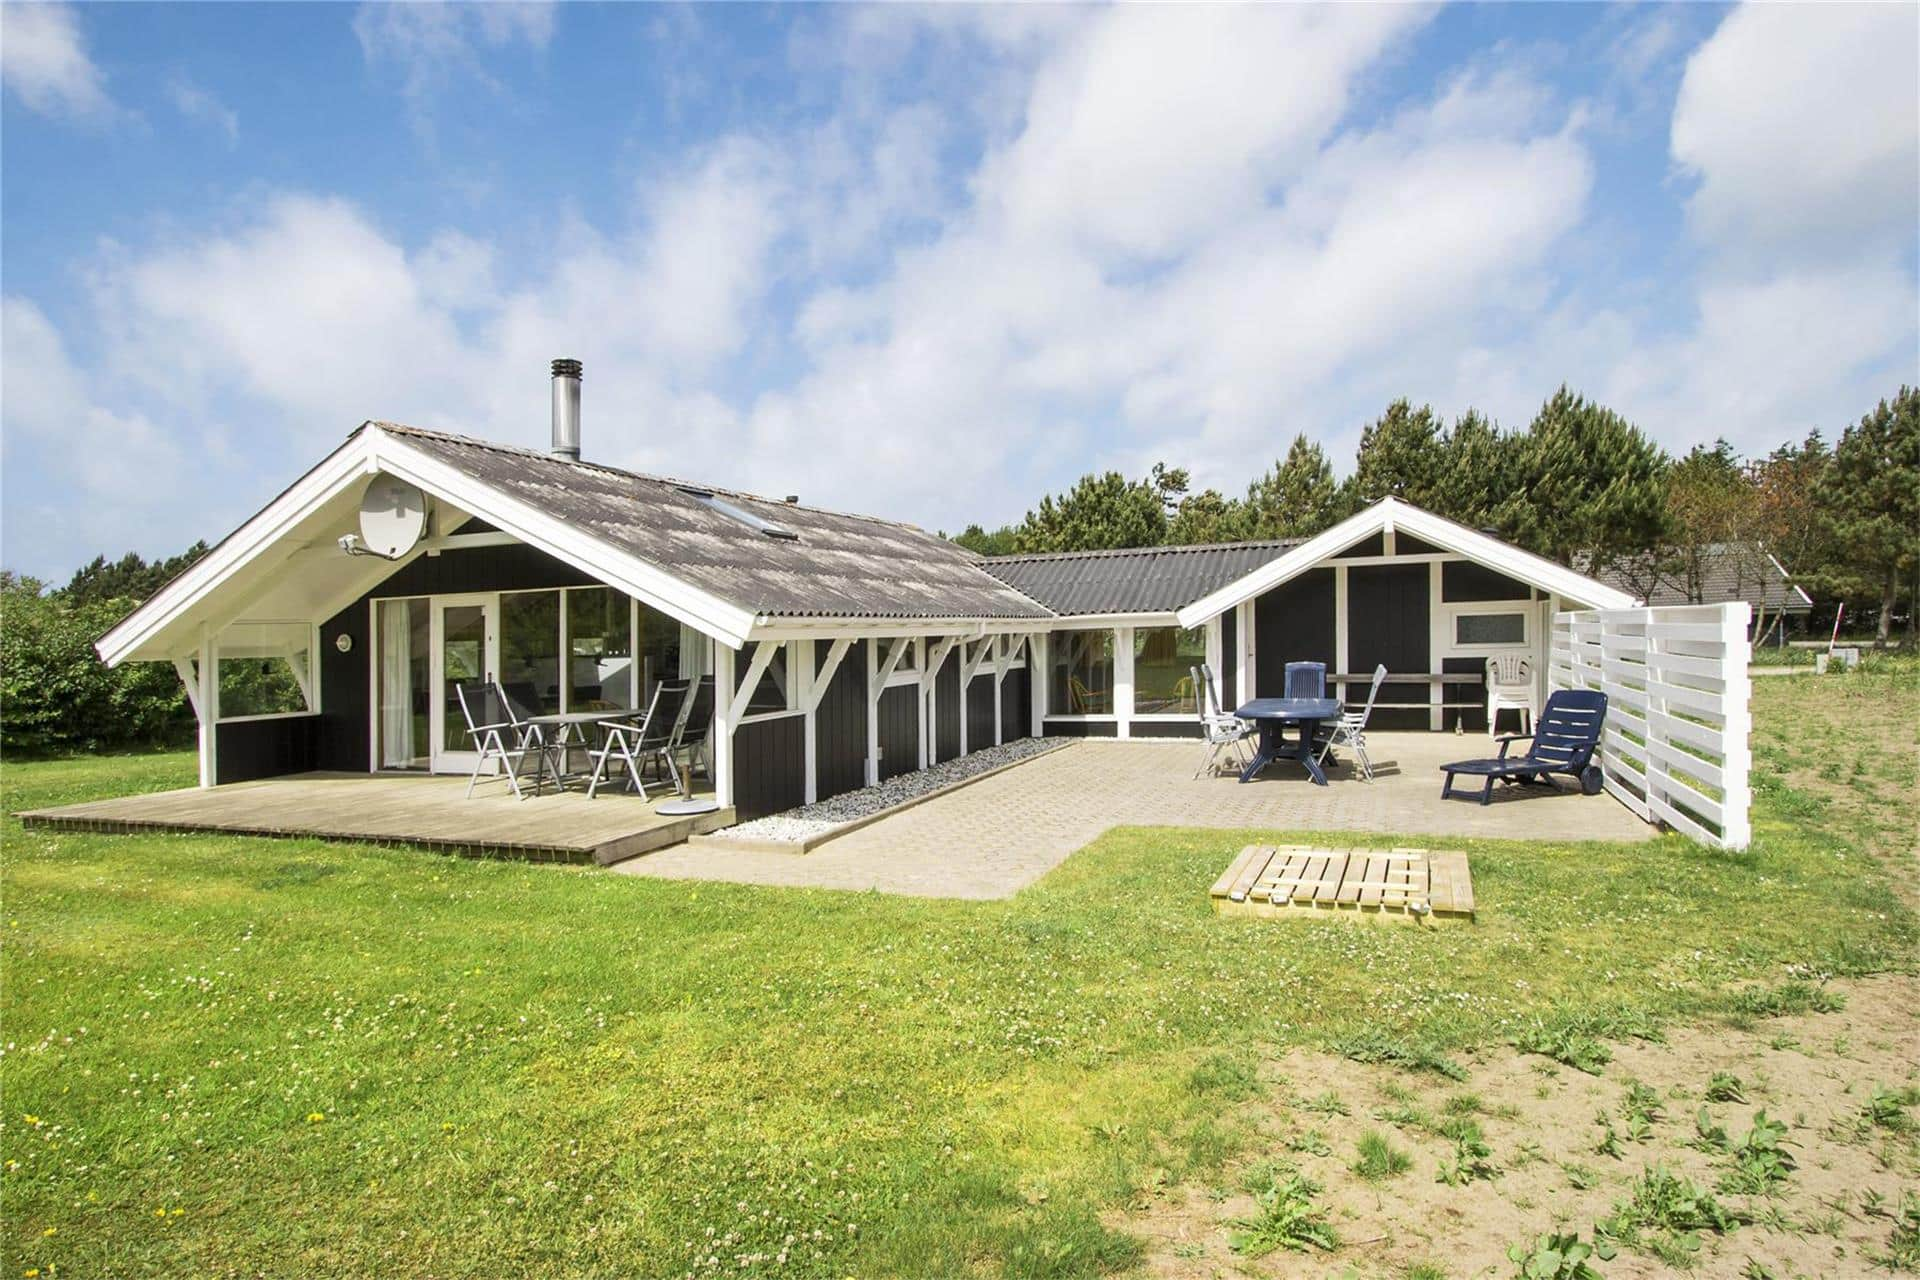 Afbeelding 1-14 Vakantiehuis 1032, Fladen Grund 3, DK - 9800 Hjørring